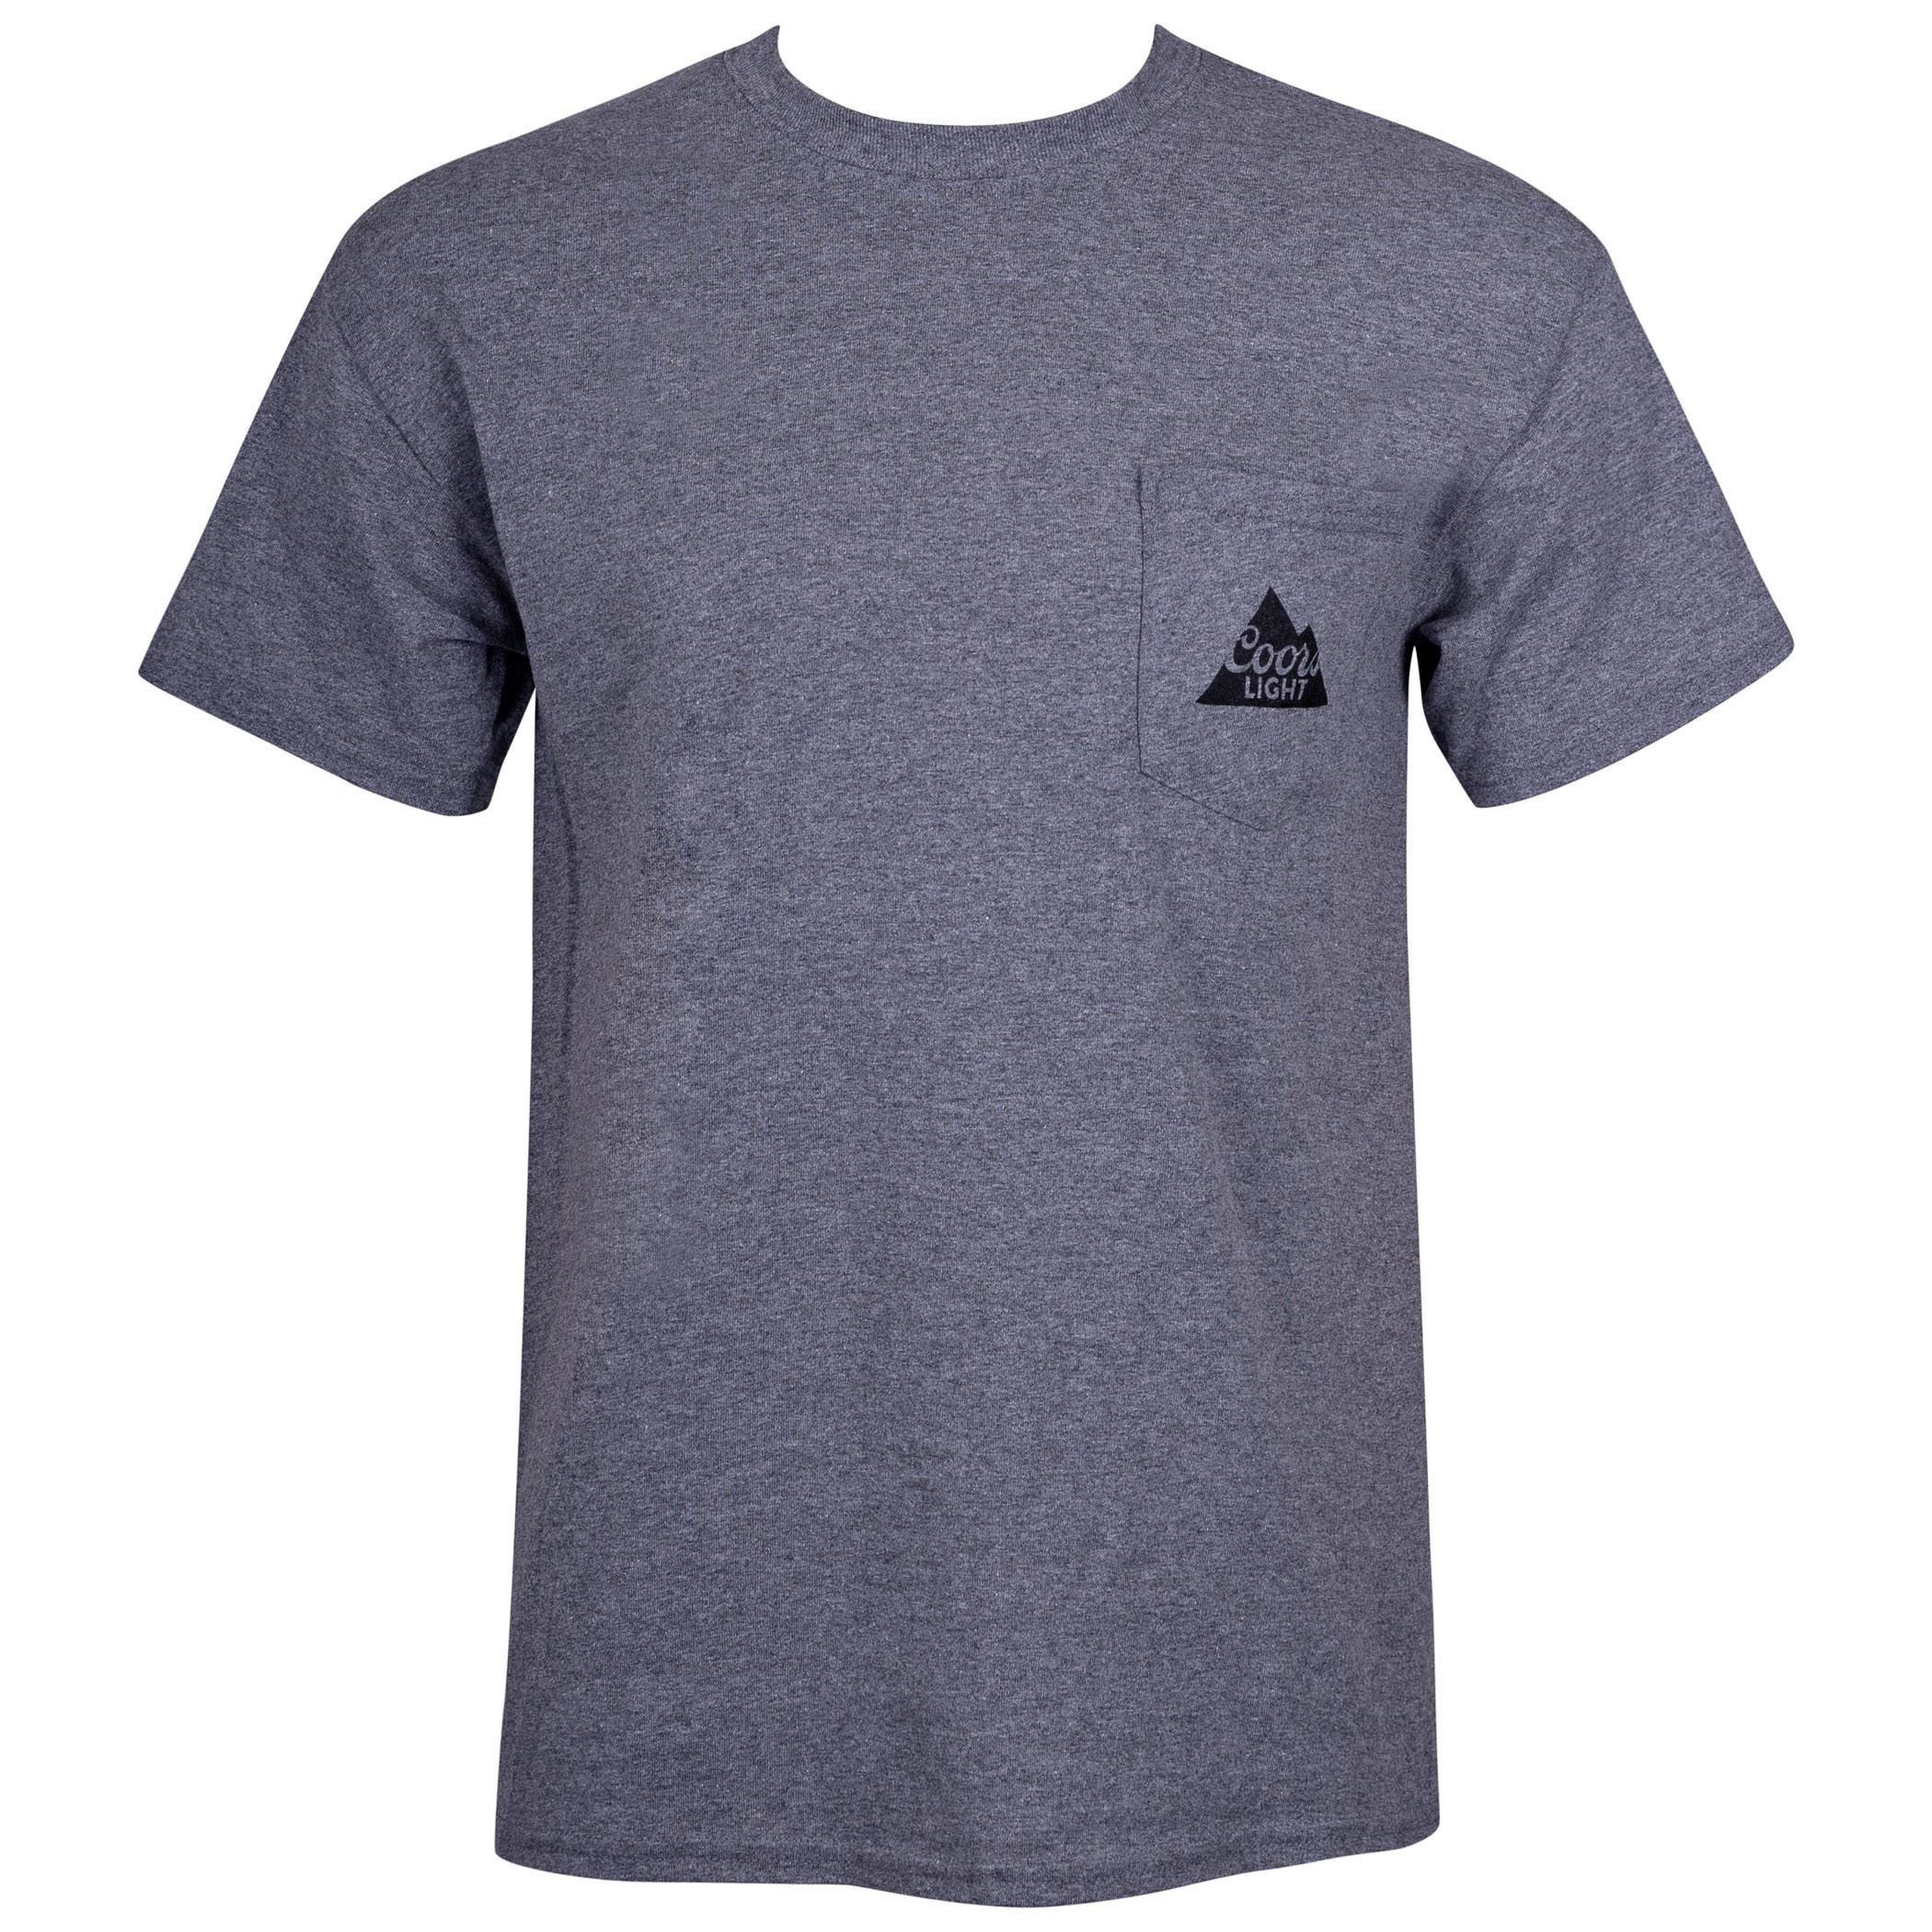 Coors Light Grey Pocket Tee Shirt